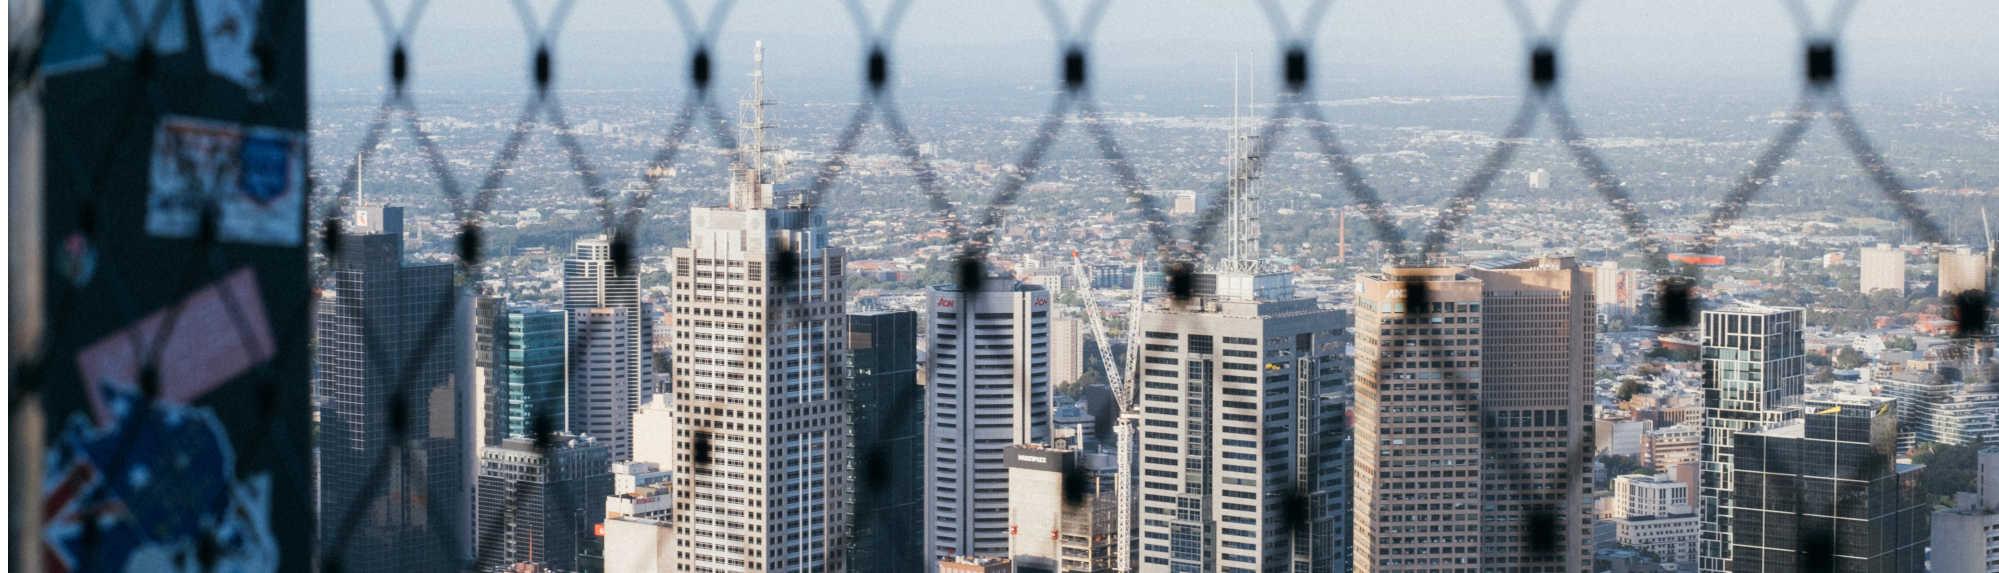 How to Enjoy Melbourne's Eureka Skydeck